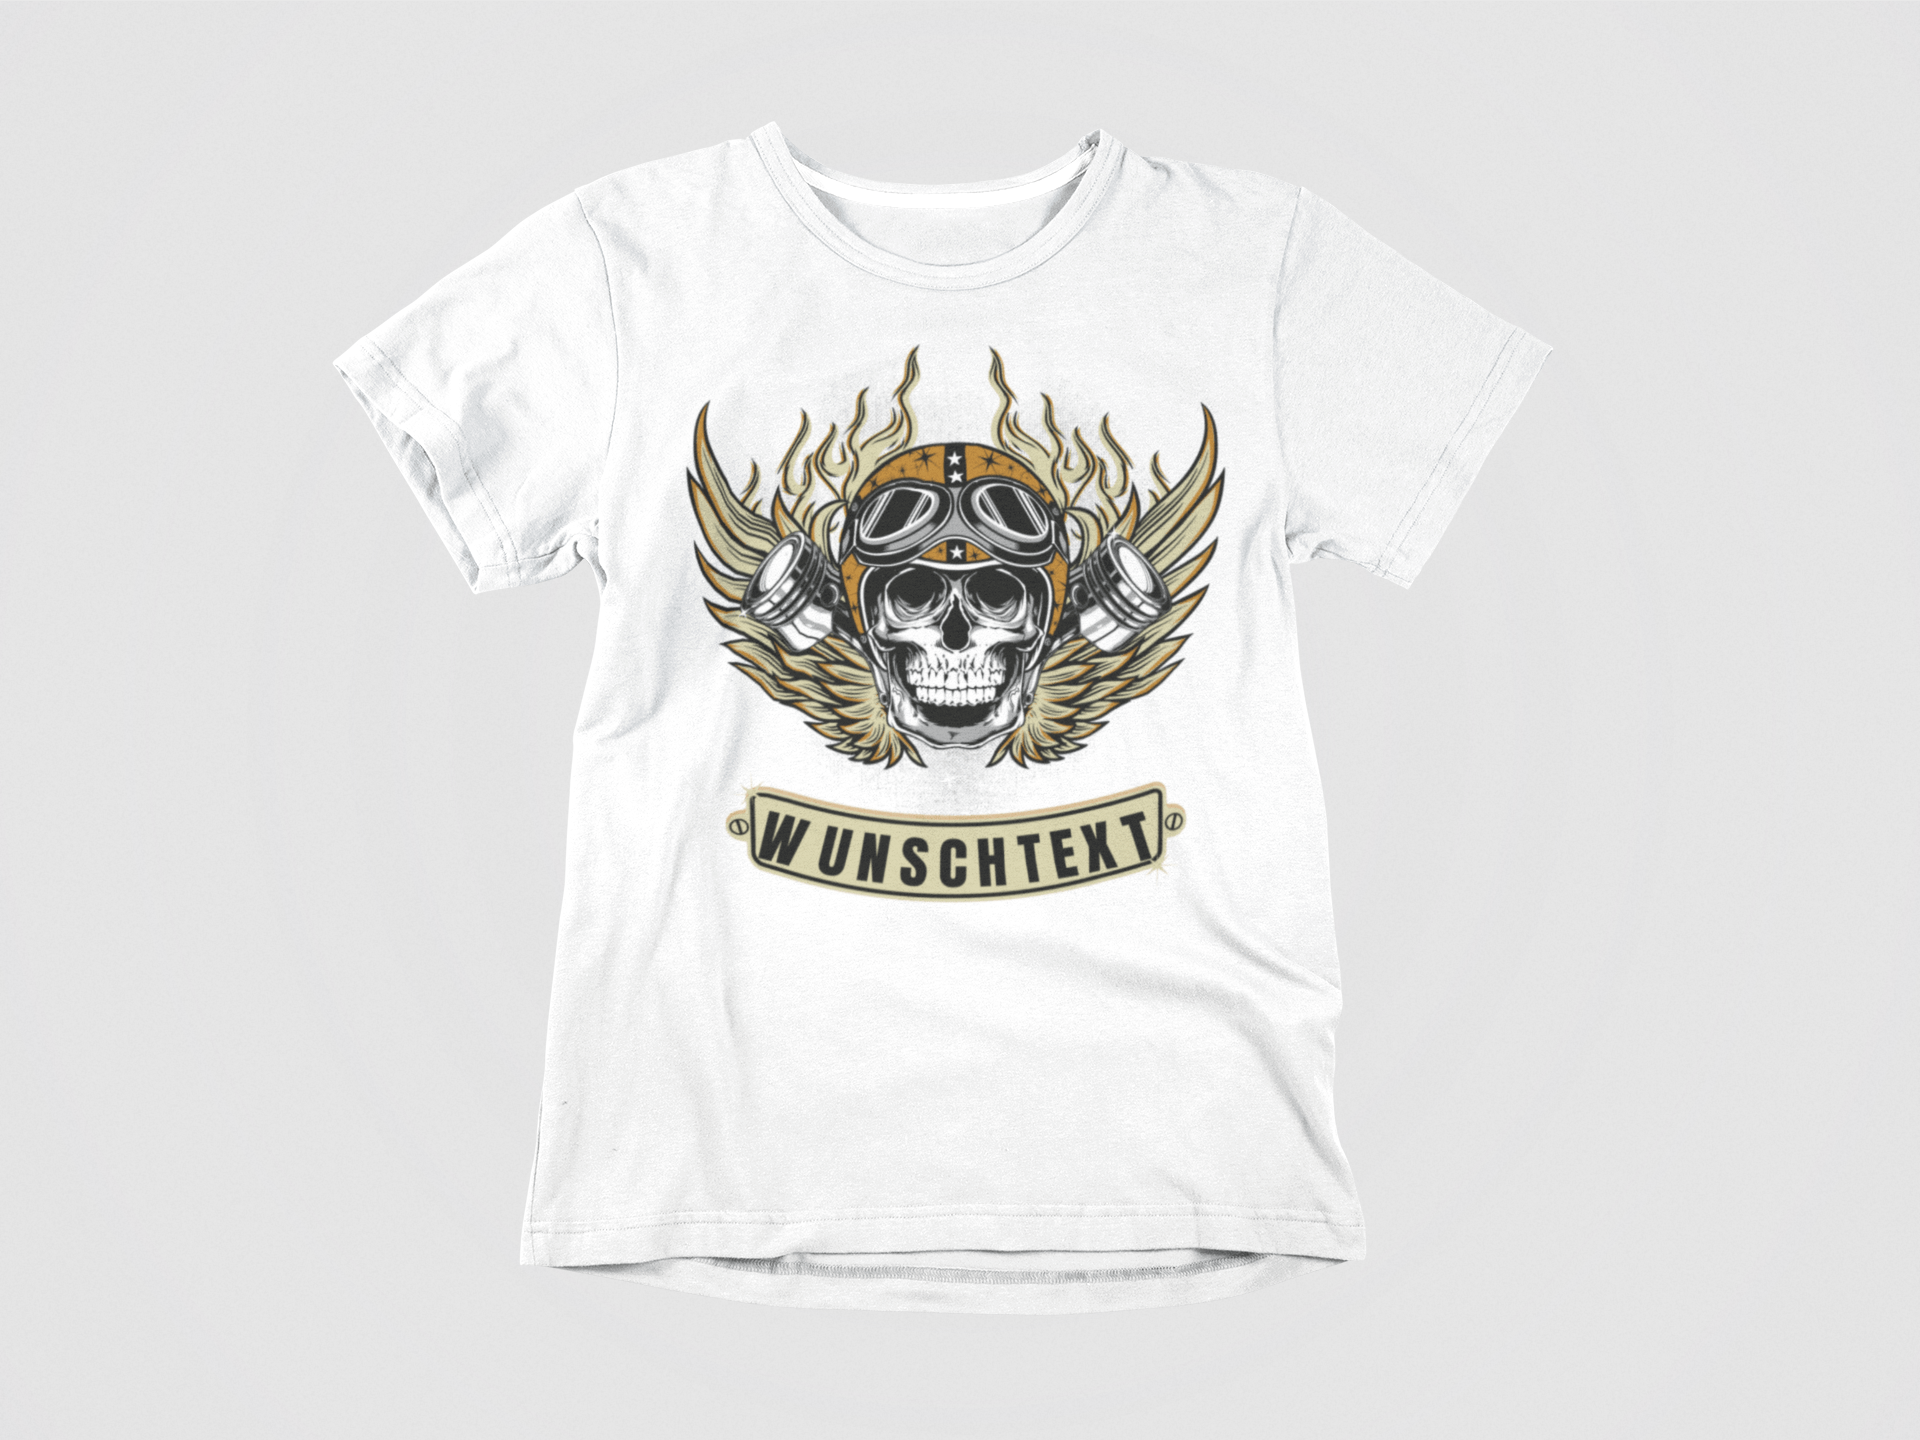 24a397abe98dd5 Totenkopf T-shirt Herren bedrucken lassen - Coole Shirts mit Totenkopf